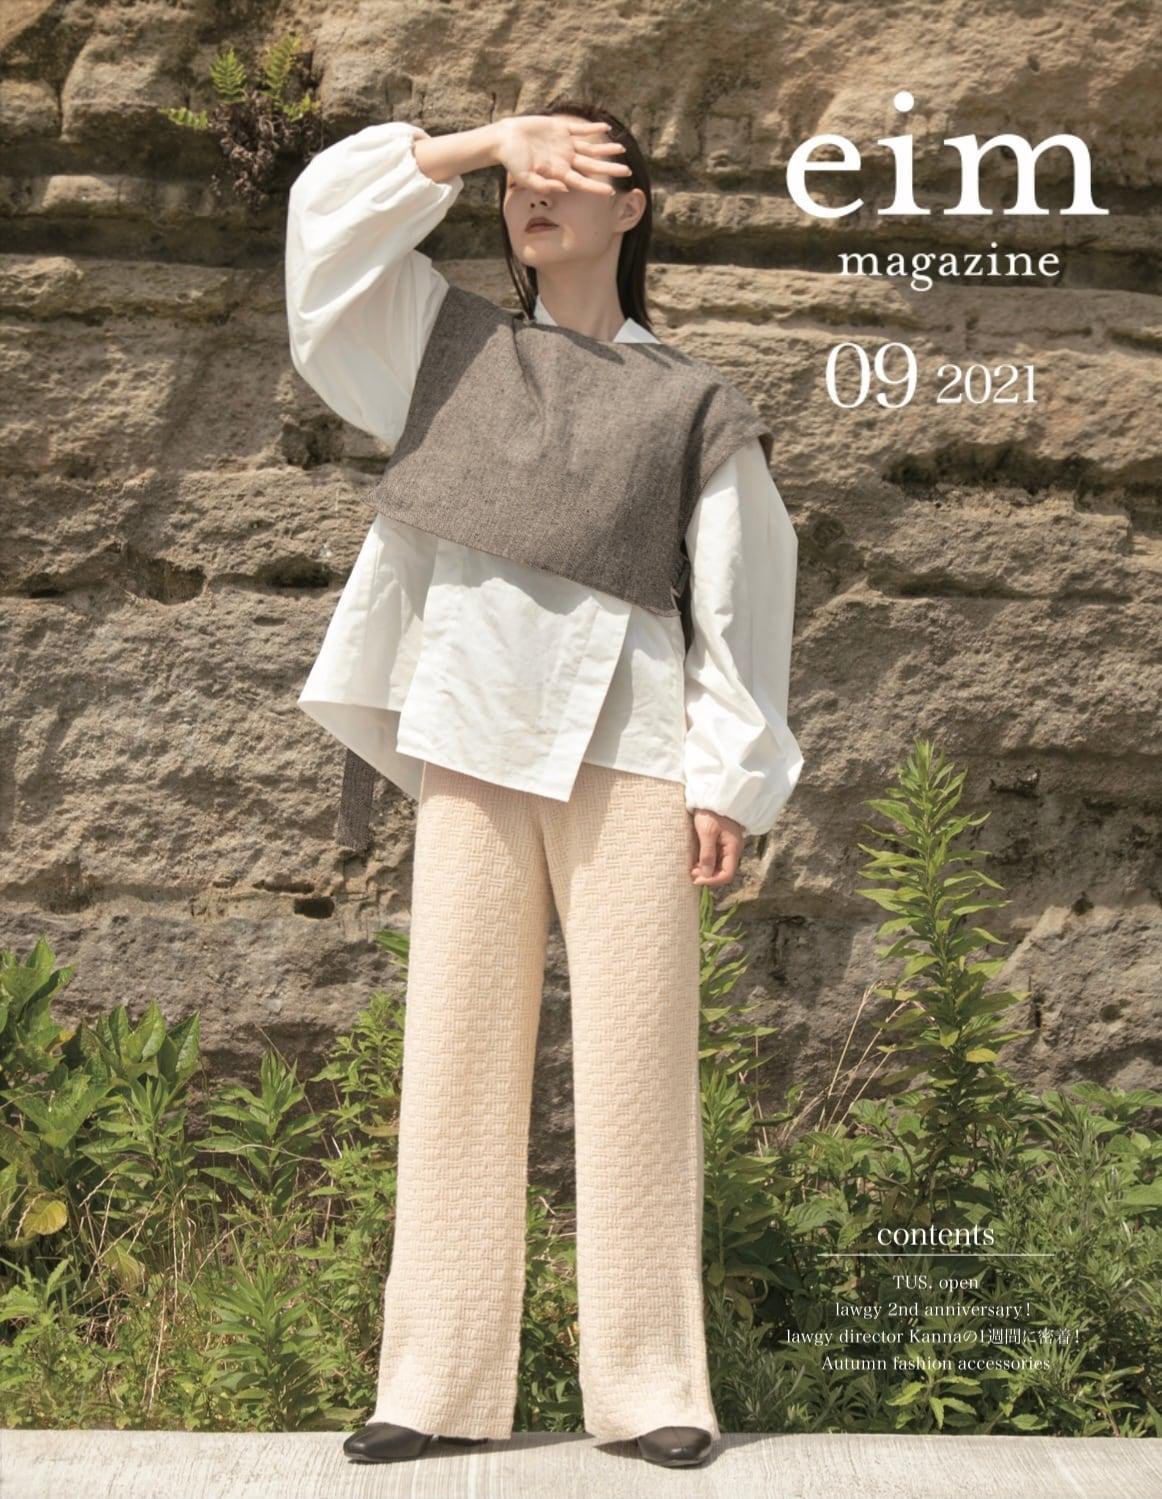 Eim magazine 2021.09